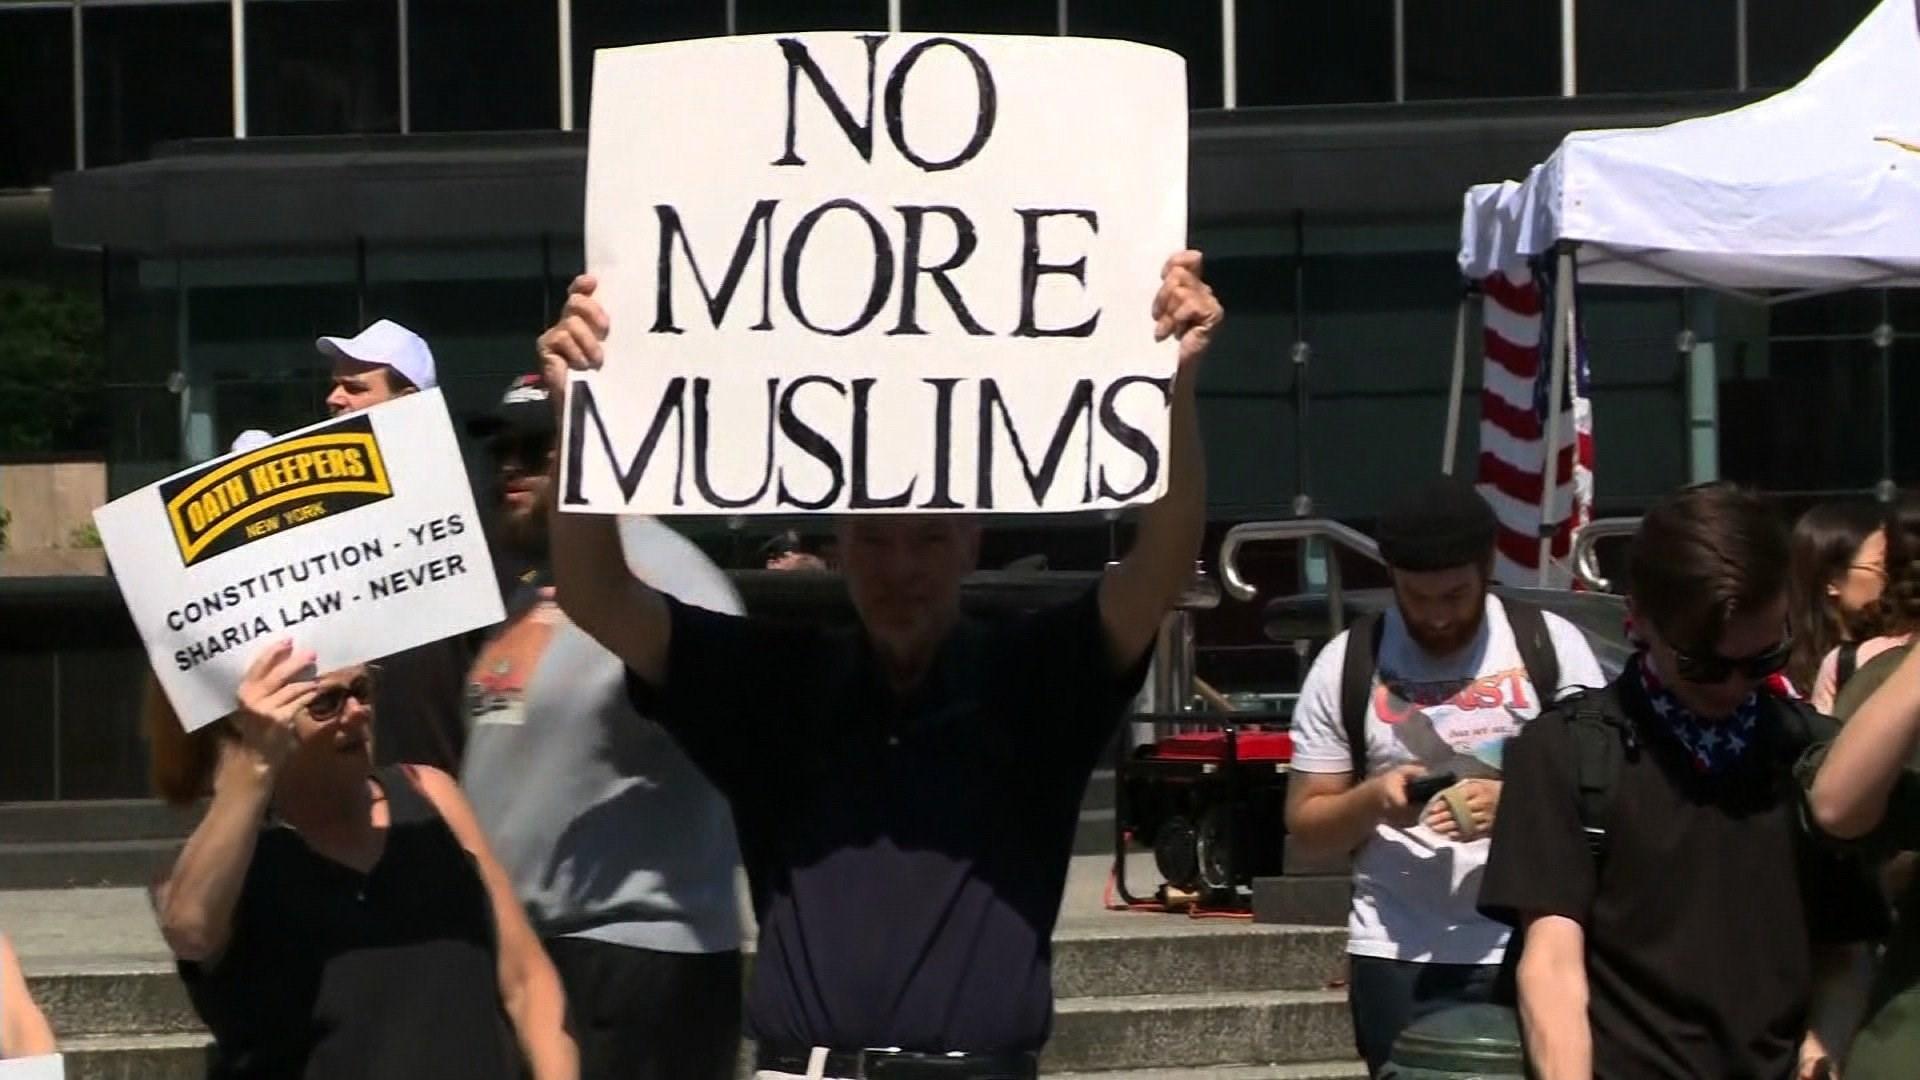 March Against Sharia